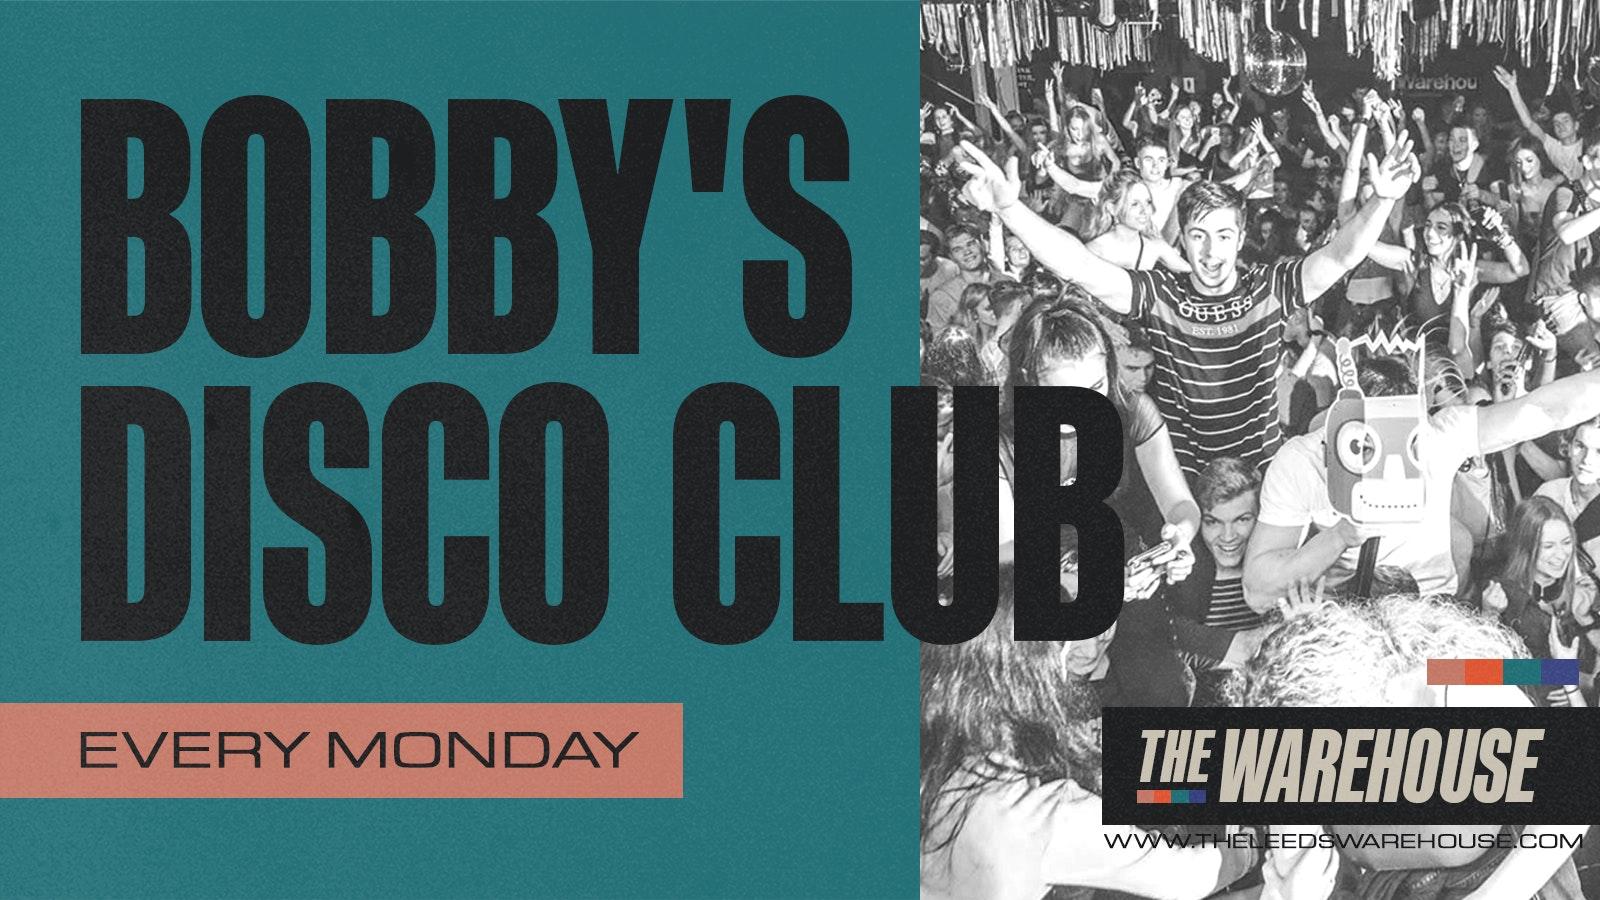 Bobbys Disco – Club